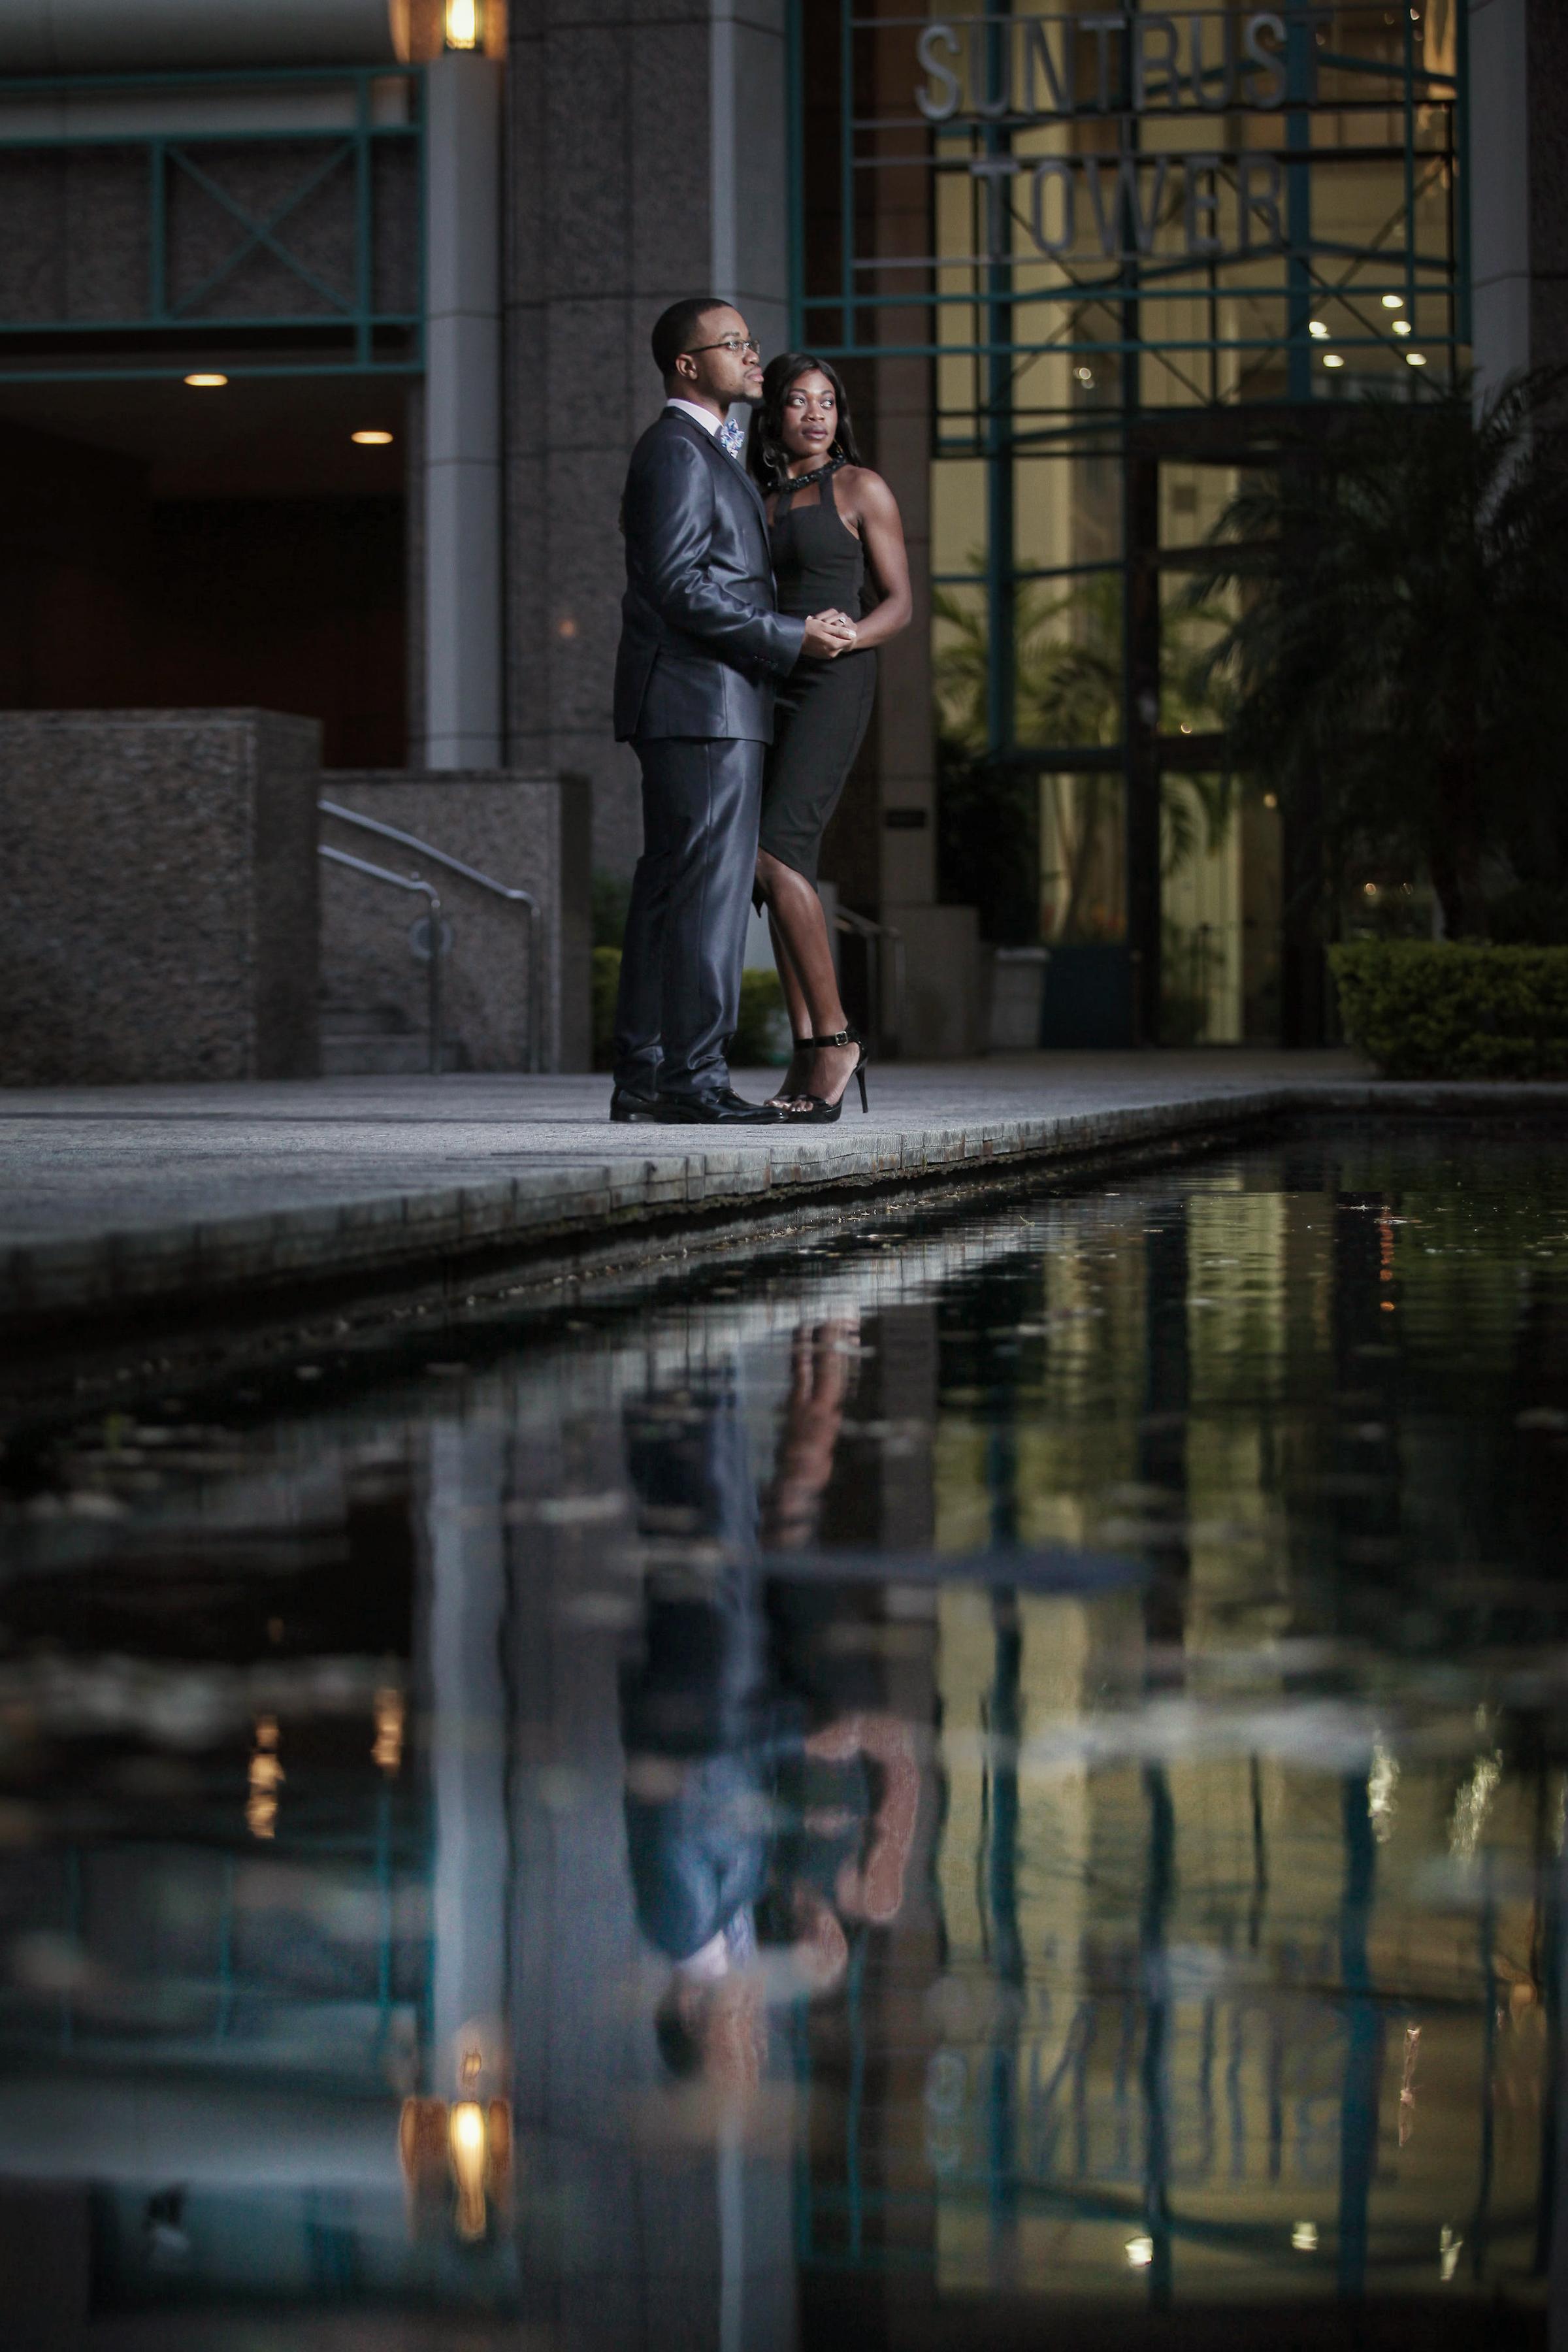 JARSTUDIO-5962-romantic-elegant-engagement-water-photographer.jpg